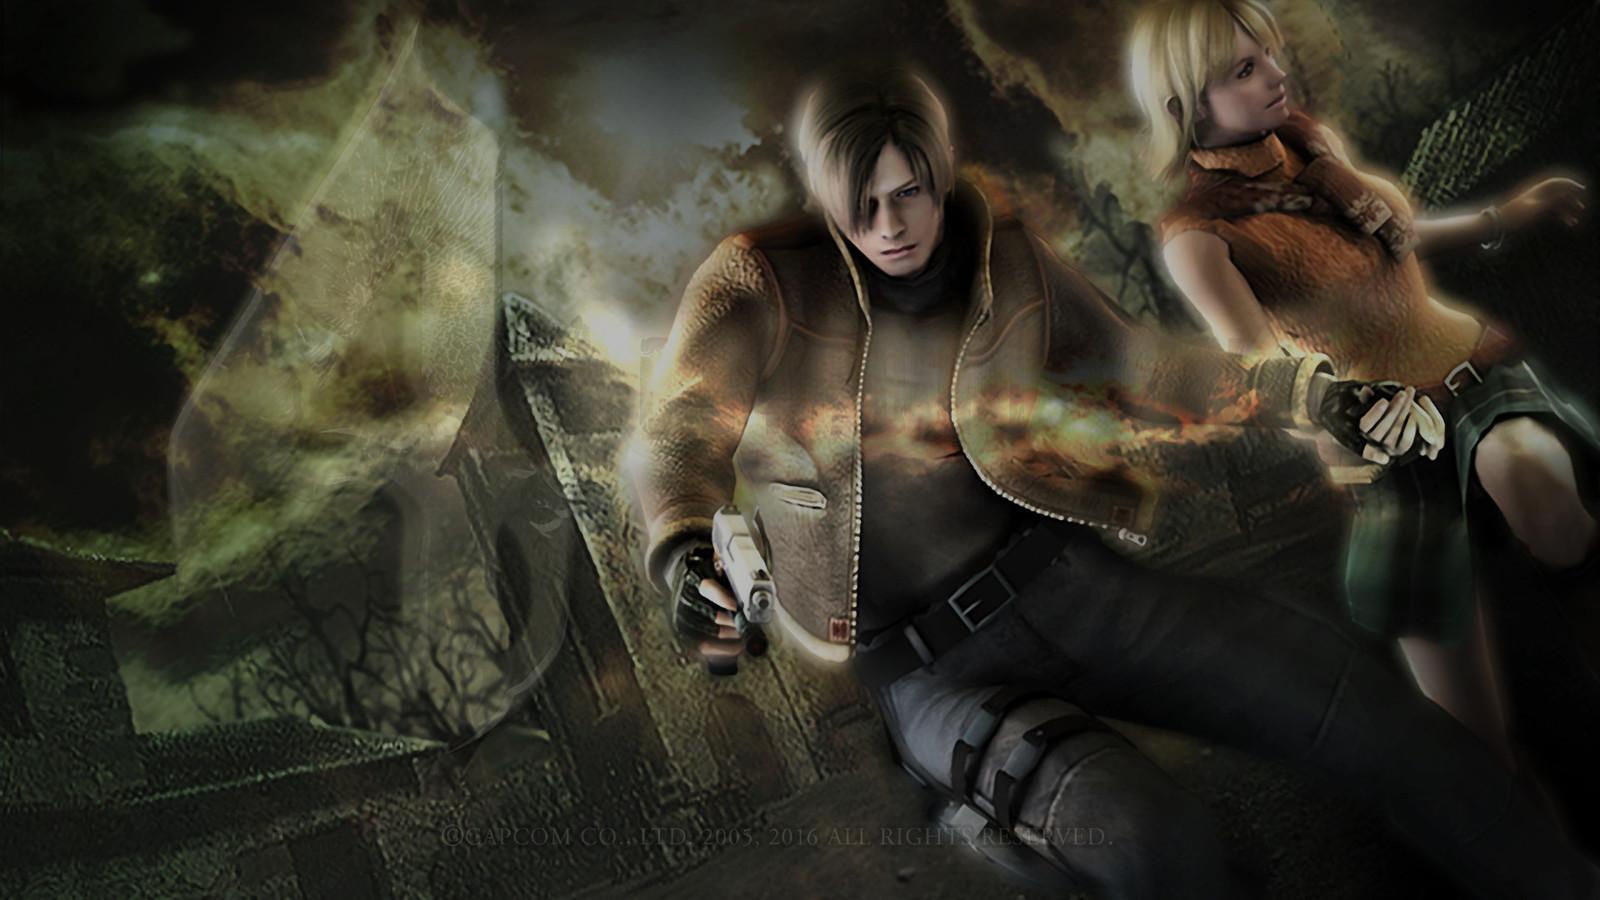 The Legend Of Zelda Wallpaper Hd Resident Evil 4 Review Xbox One Gamespew